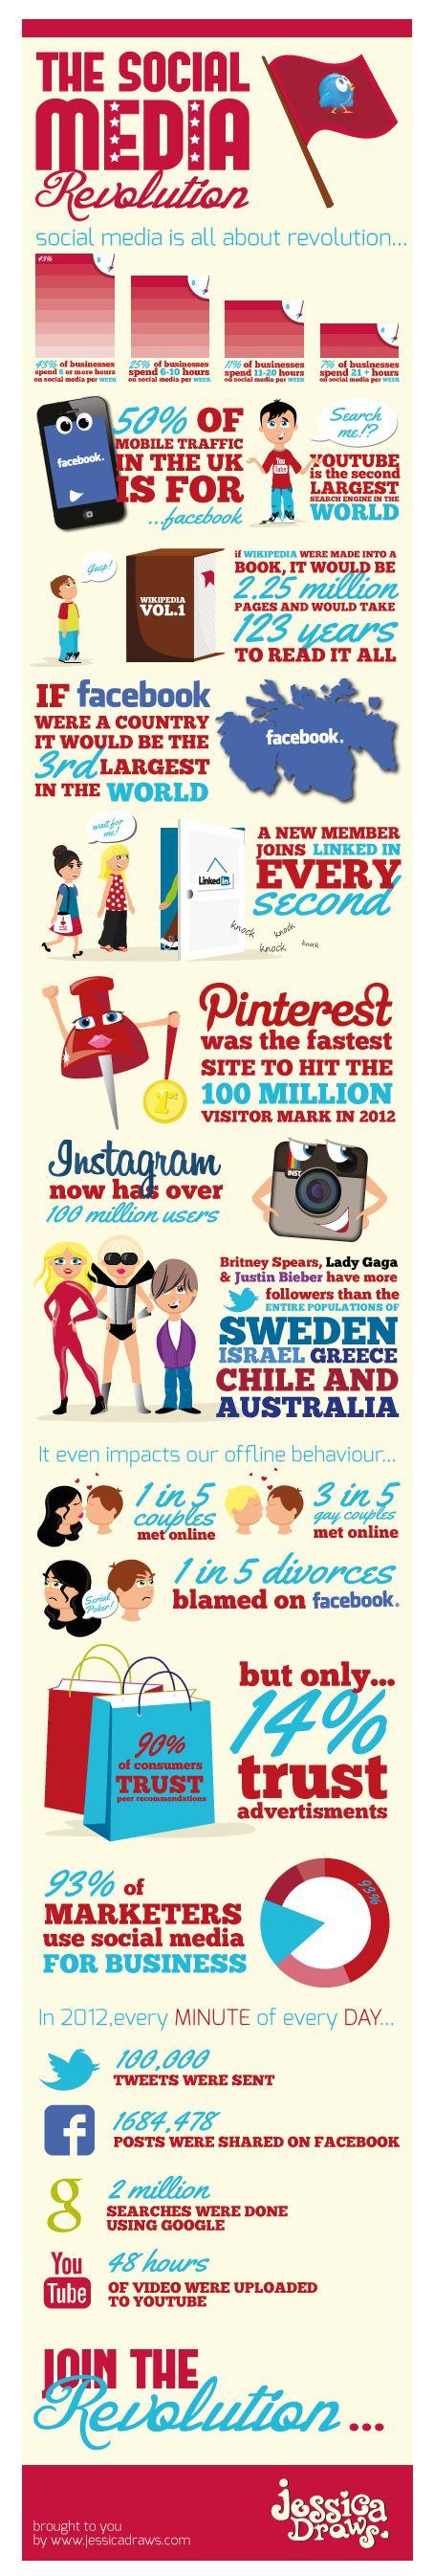 The Social media revolution #infografia #infographic #socialmedia